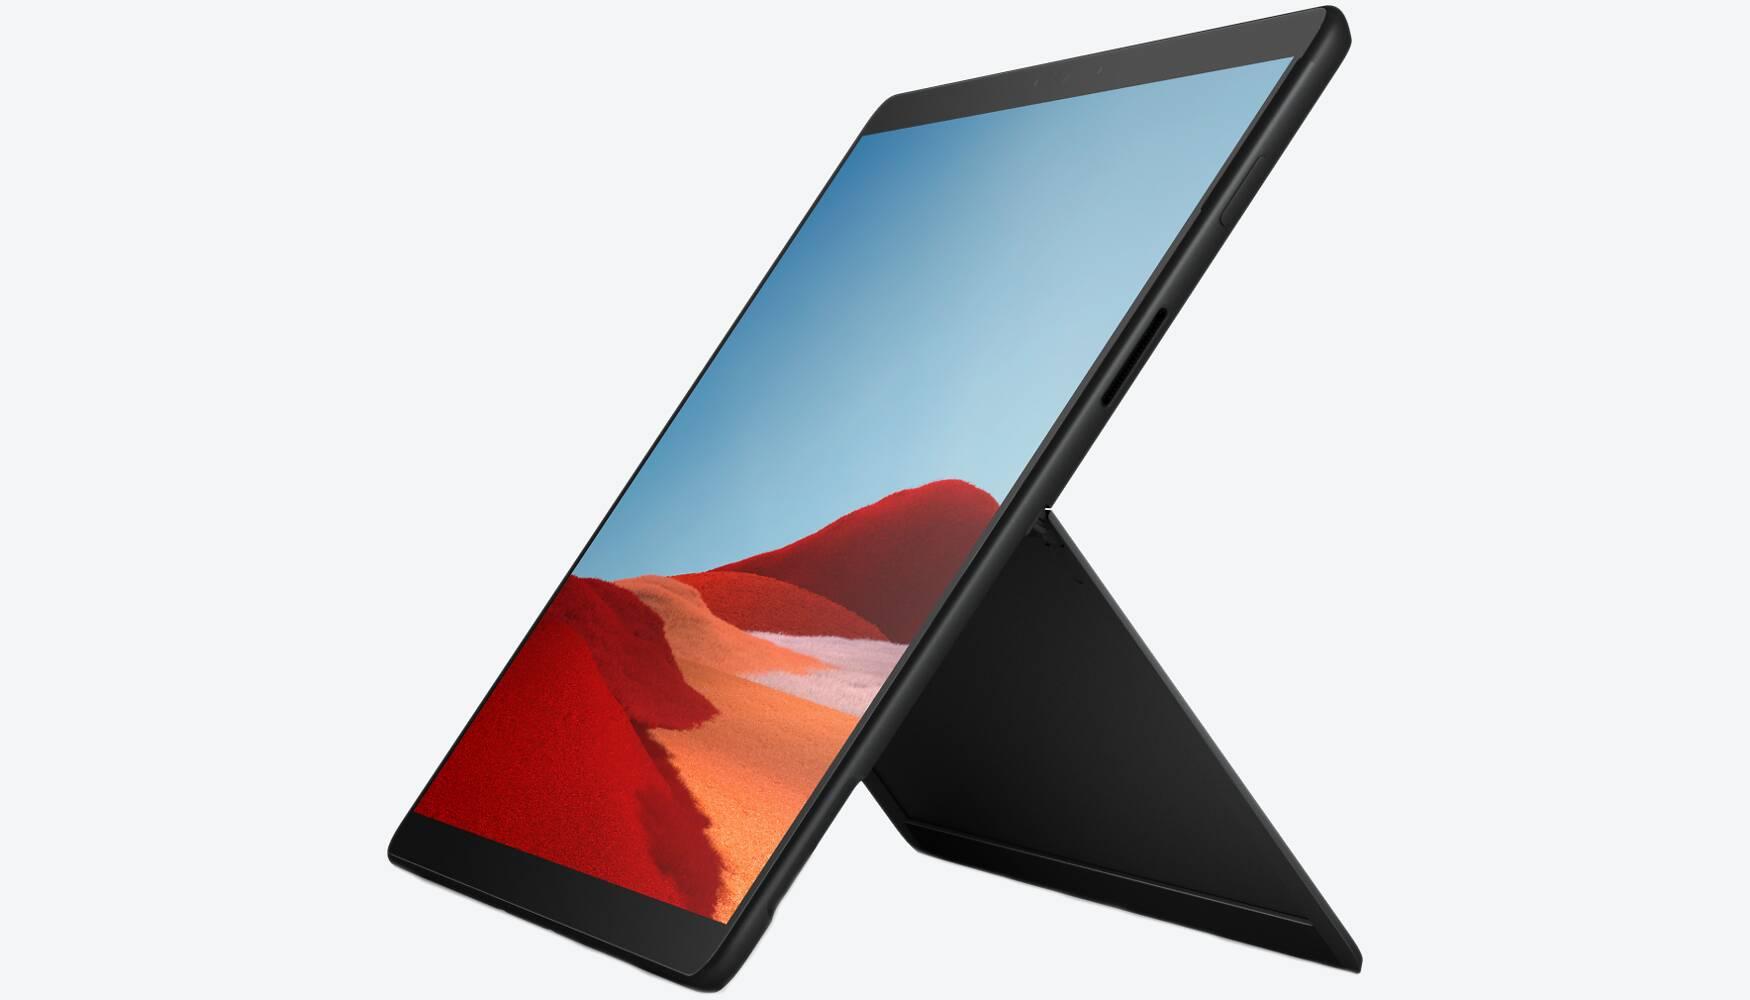 Microsoft Surface Pro X, 8GB RAM, 128GB SSD, LTE